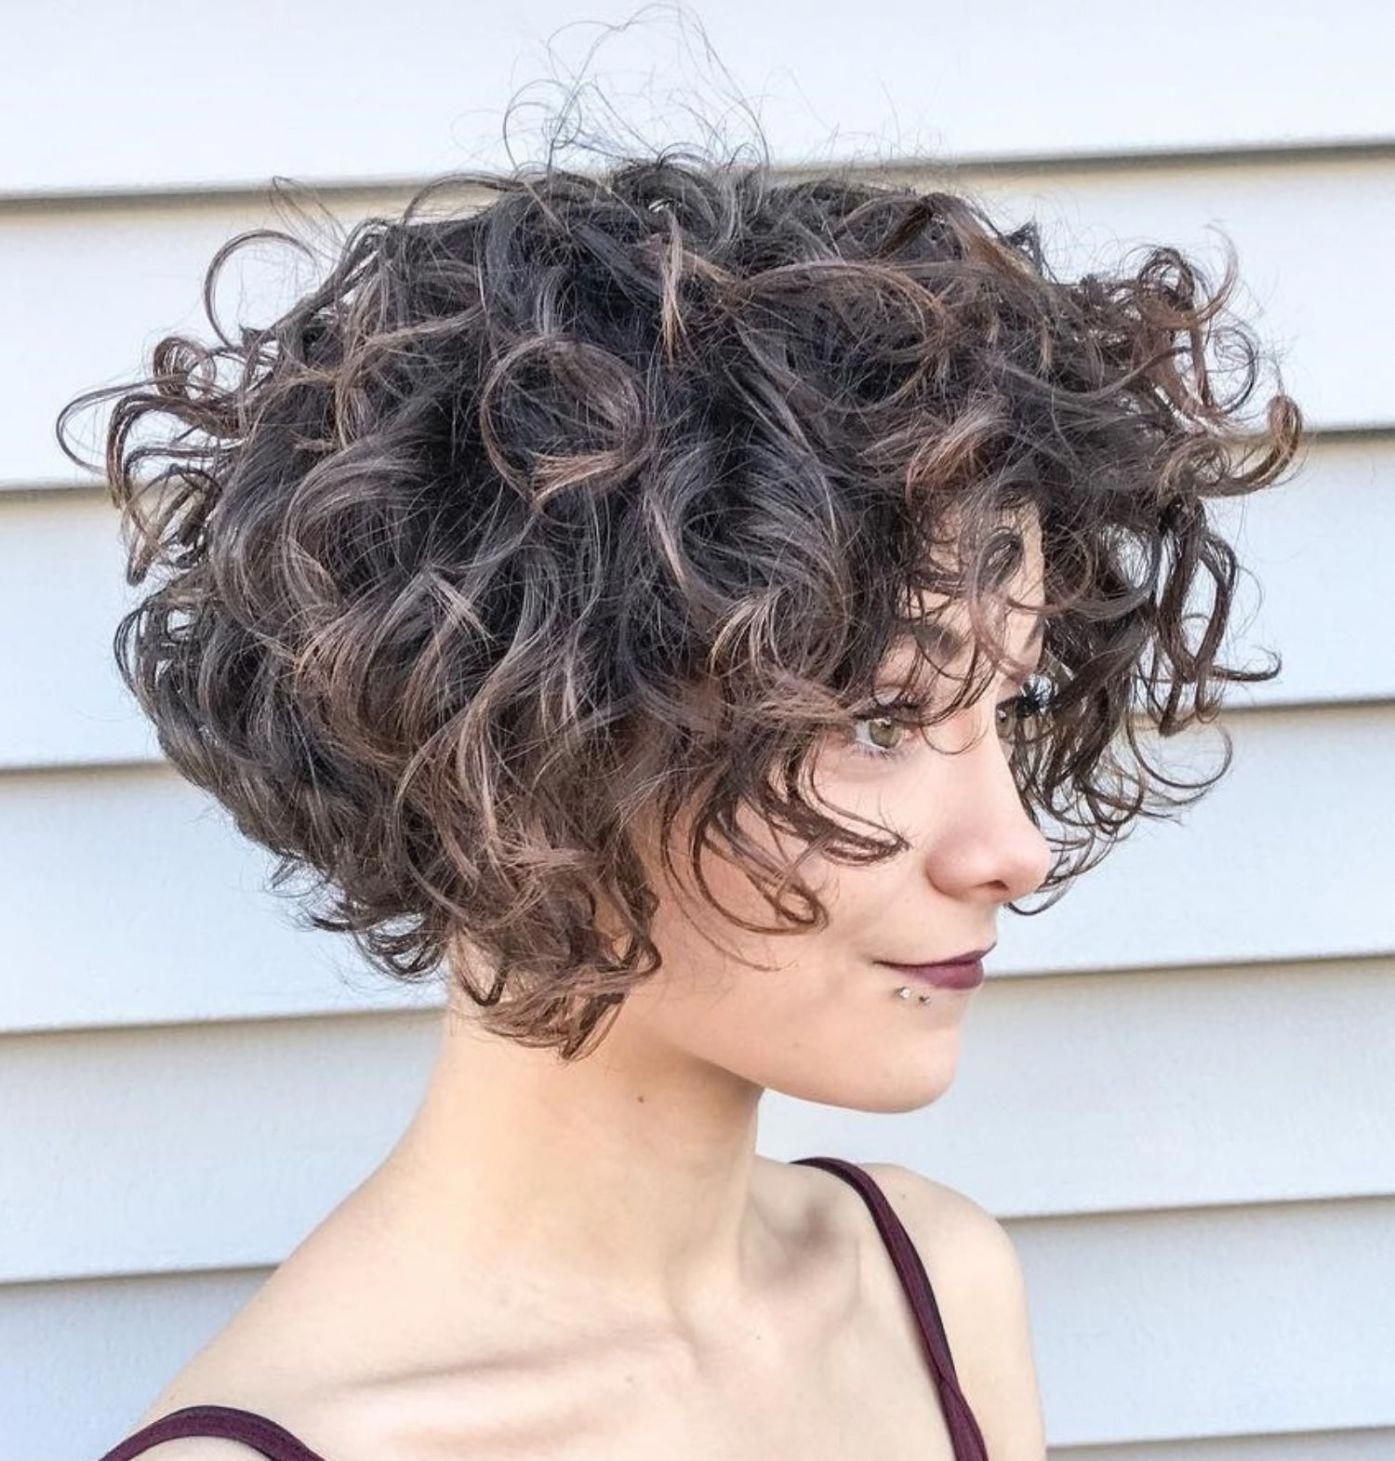 Jaw Length Curly Messy Bob Curlyhaircut Short Wavy Hair Curly Hair Styles Hair Styles